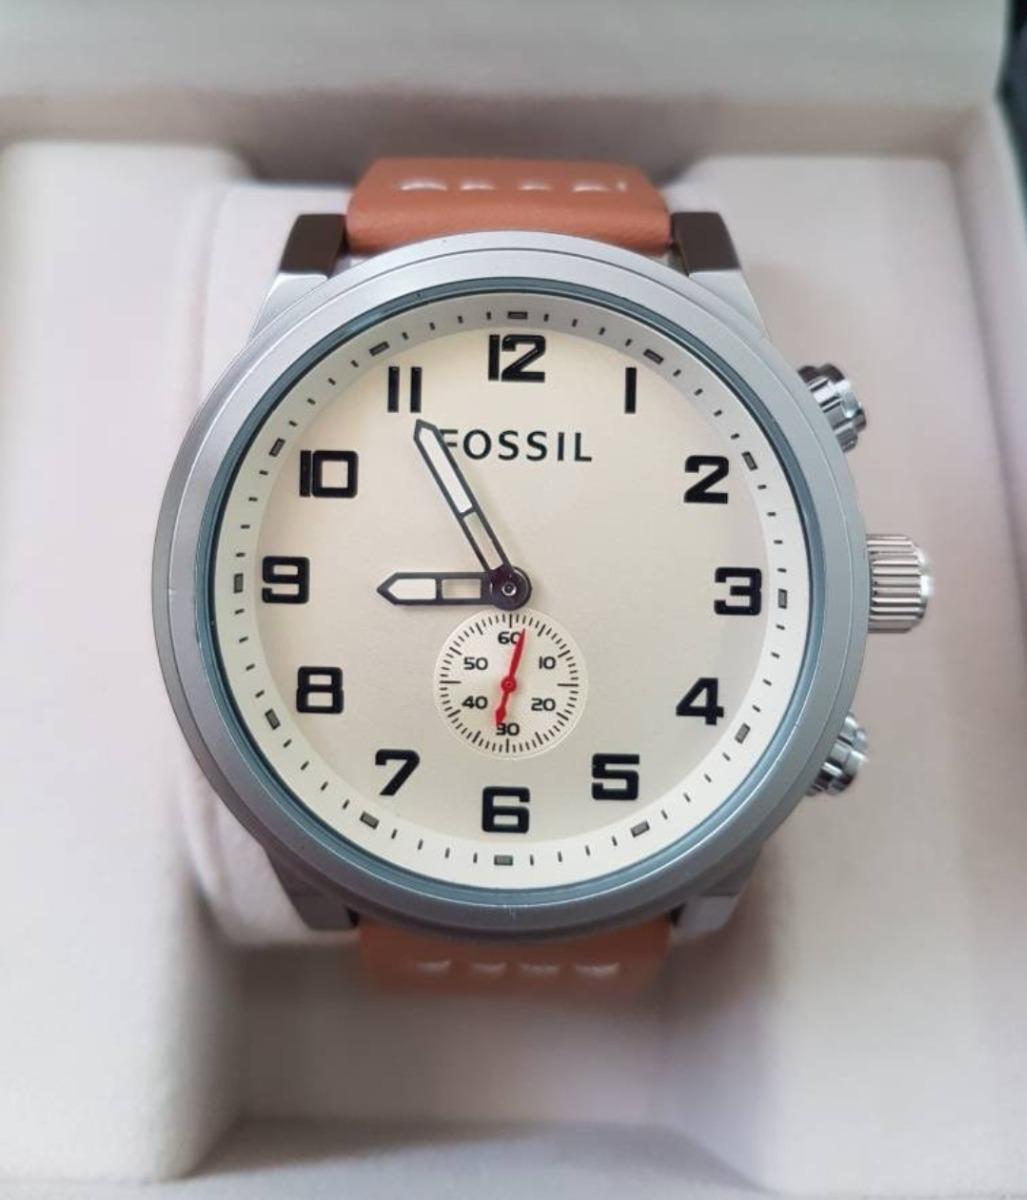 109e401093bb reloj fossil correa de cuero modelos 2018. Cargando zoom.